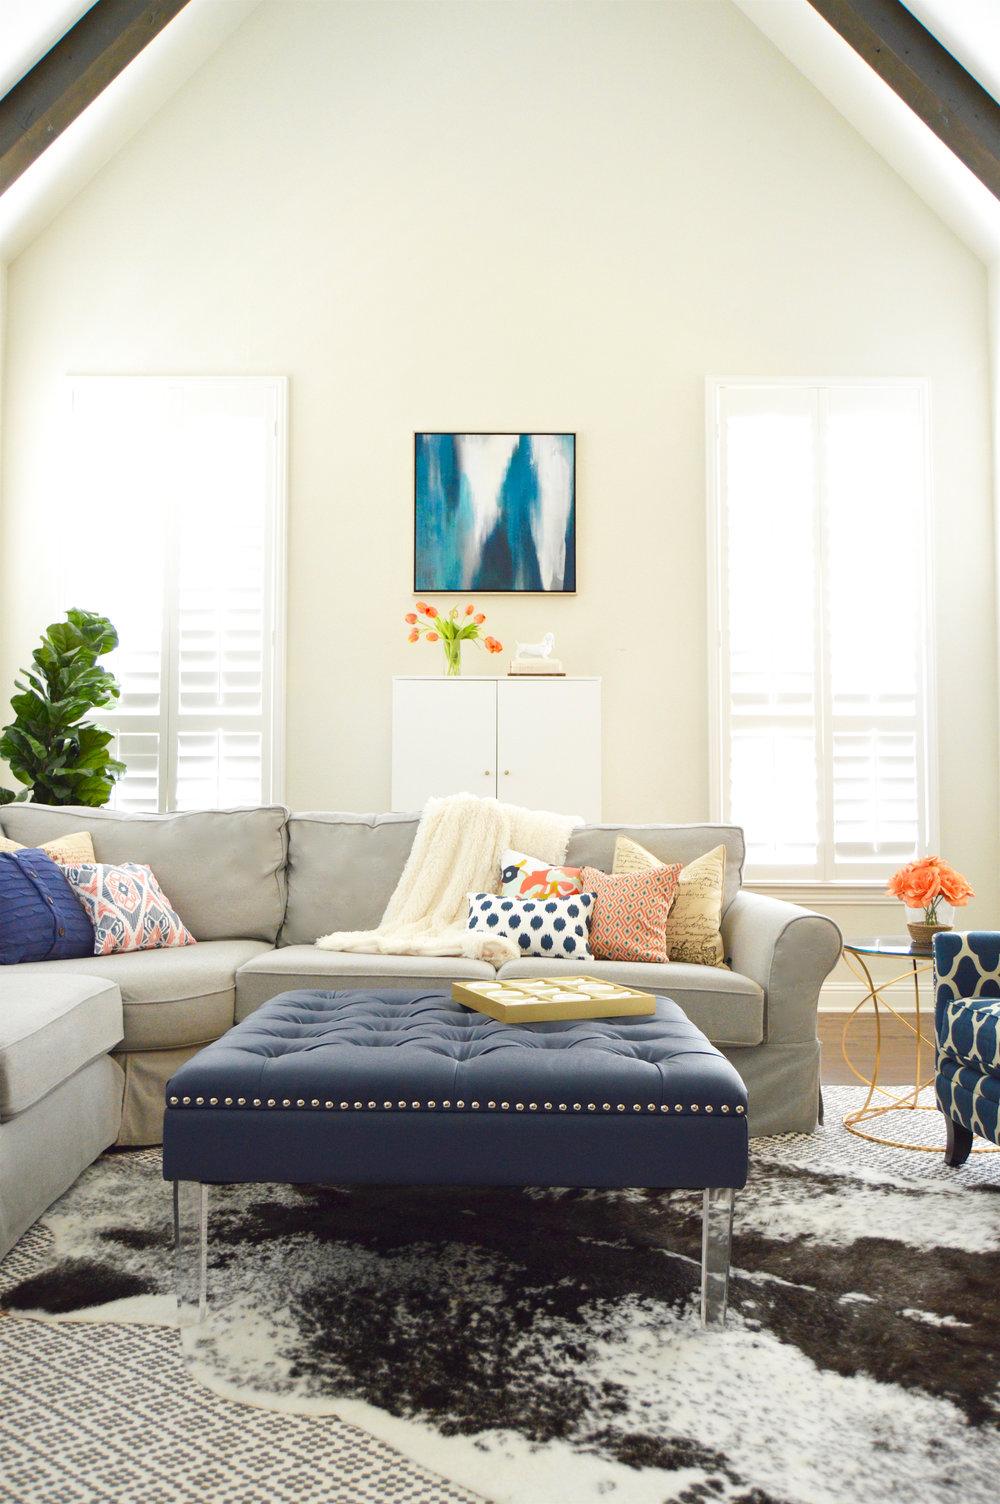 The Top Nine: Where I Shop as an Interior Designer — Brett Nicole ...